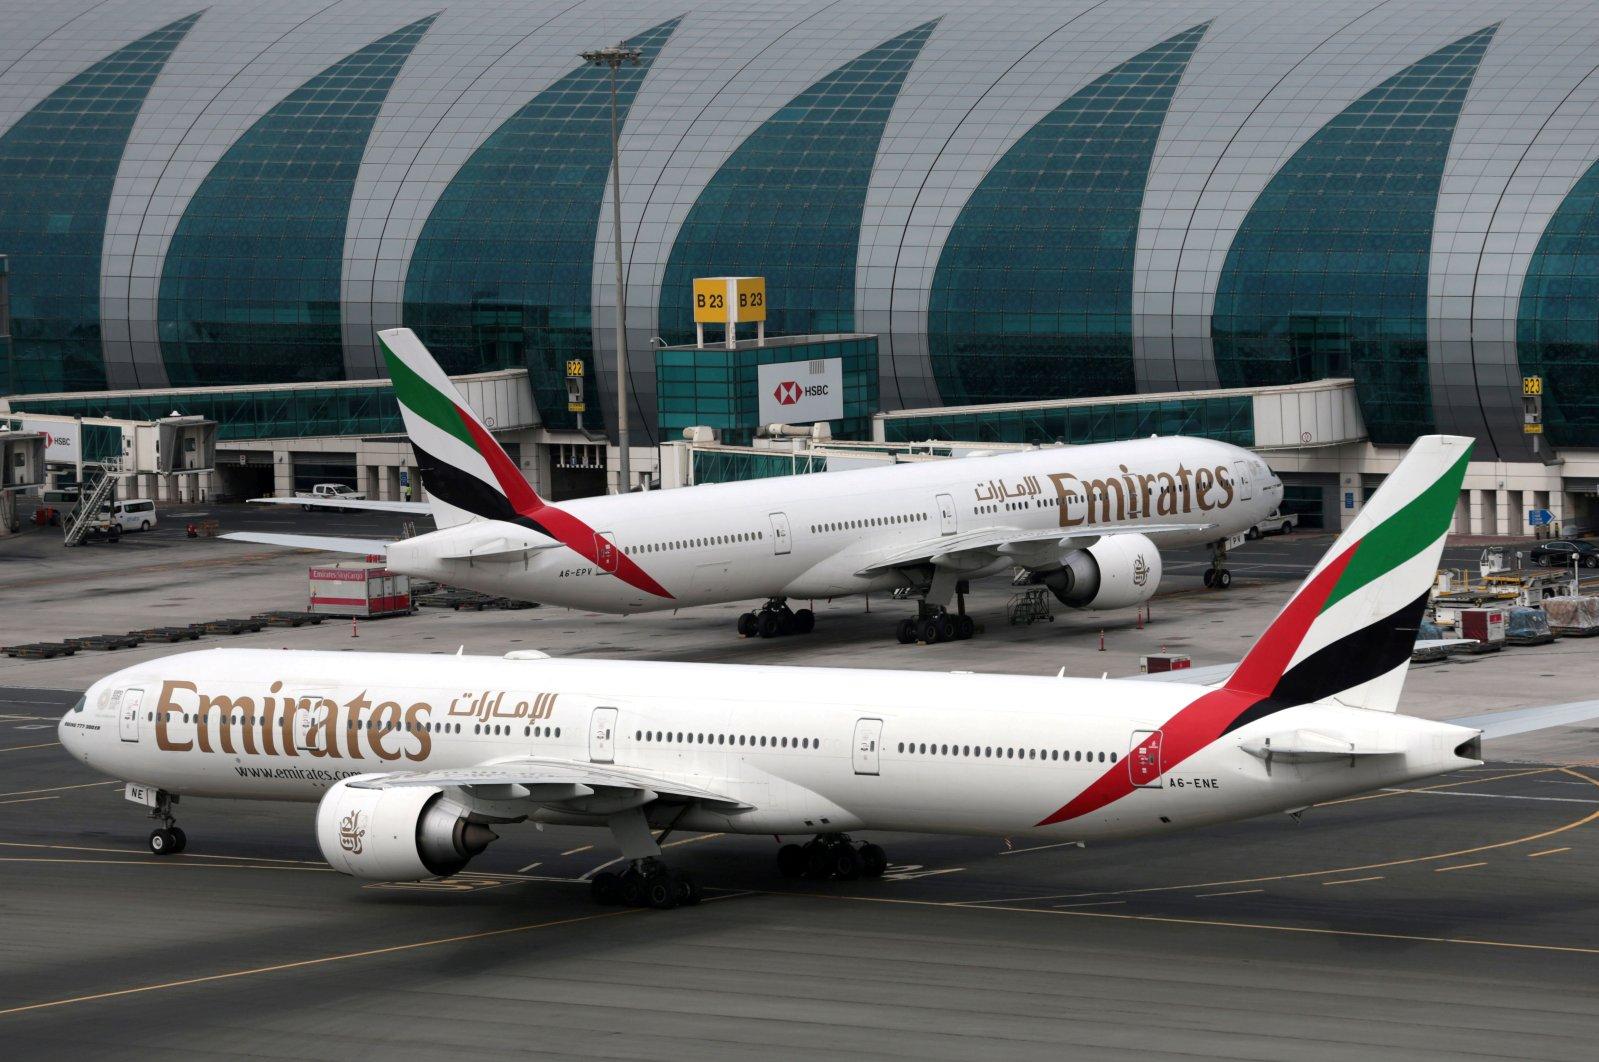 Emirates Airline Boeing 777-300ER planes are seen at Dubai International Airport in Dubai, United Arab Emirates, Feb. 15, 2019. (Reuters Photo)